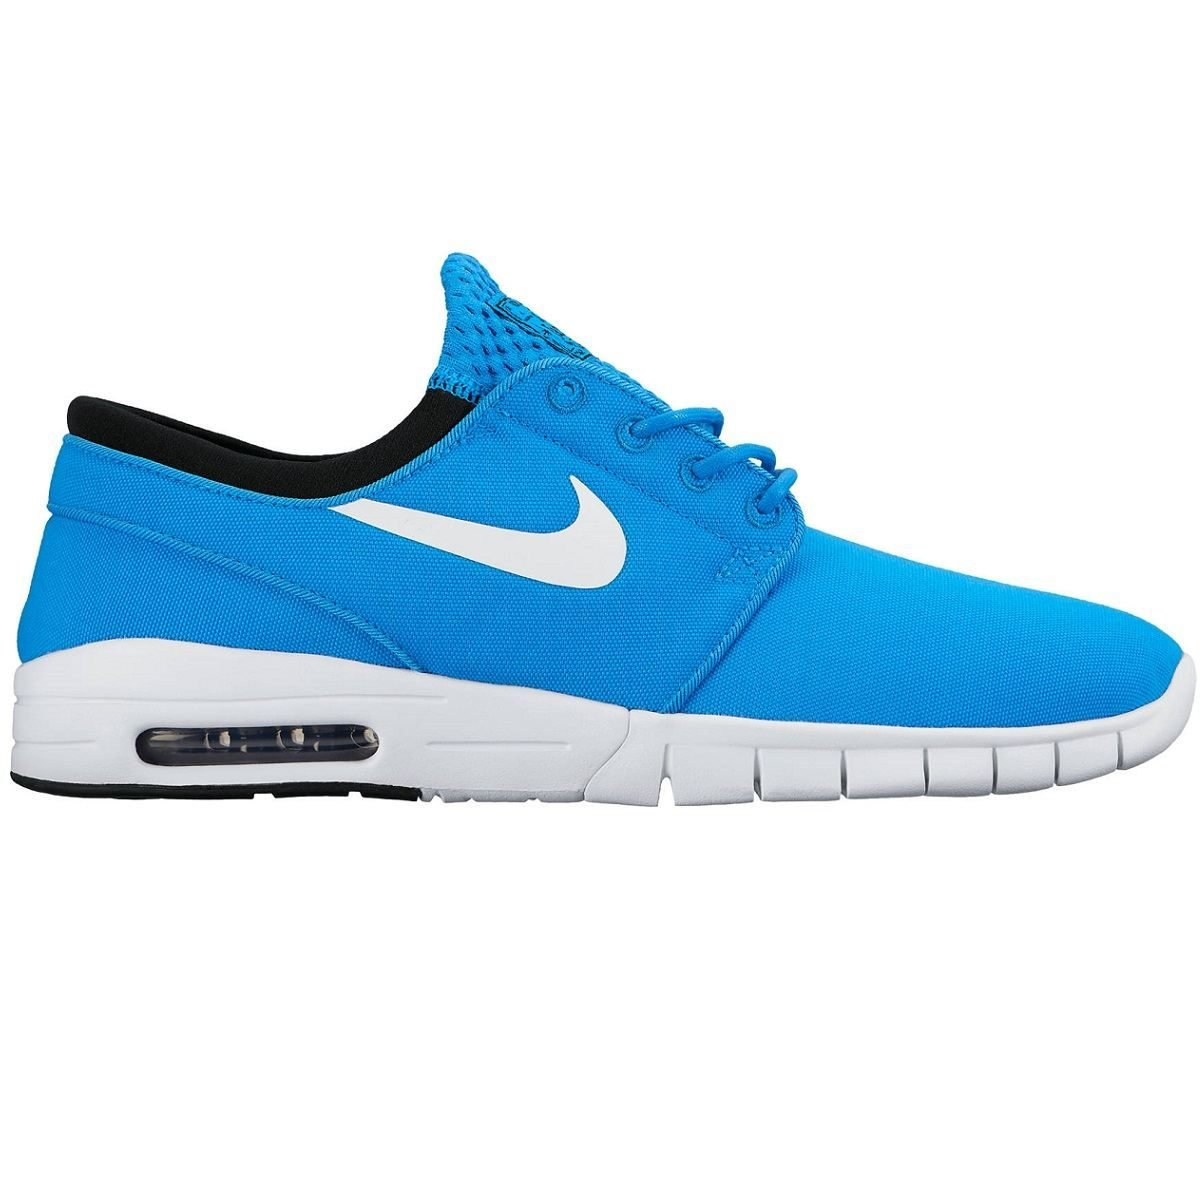 4c9946373df5 Galleon - Nike Men s Stefan Janoski Max Photo Blue White-blackSneakers -  7.5 D(M) US